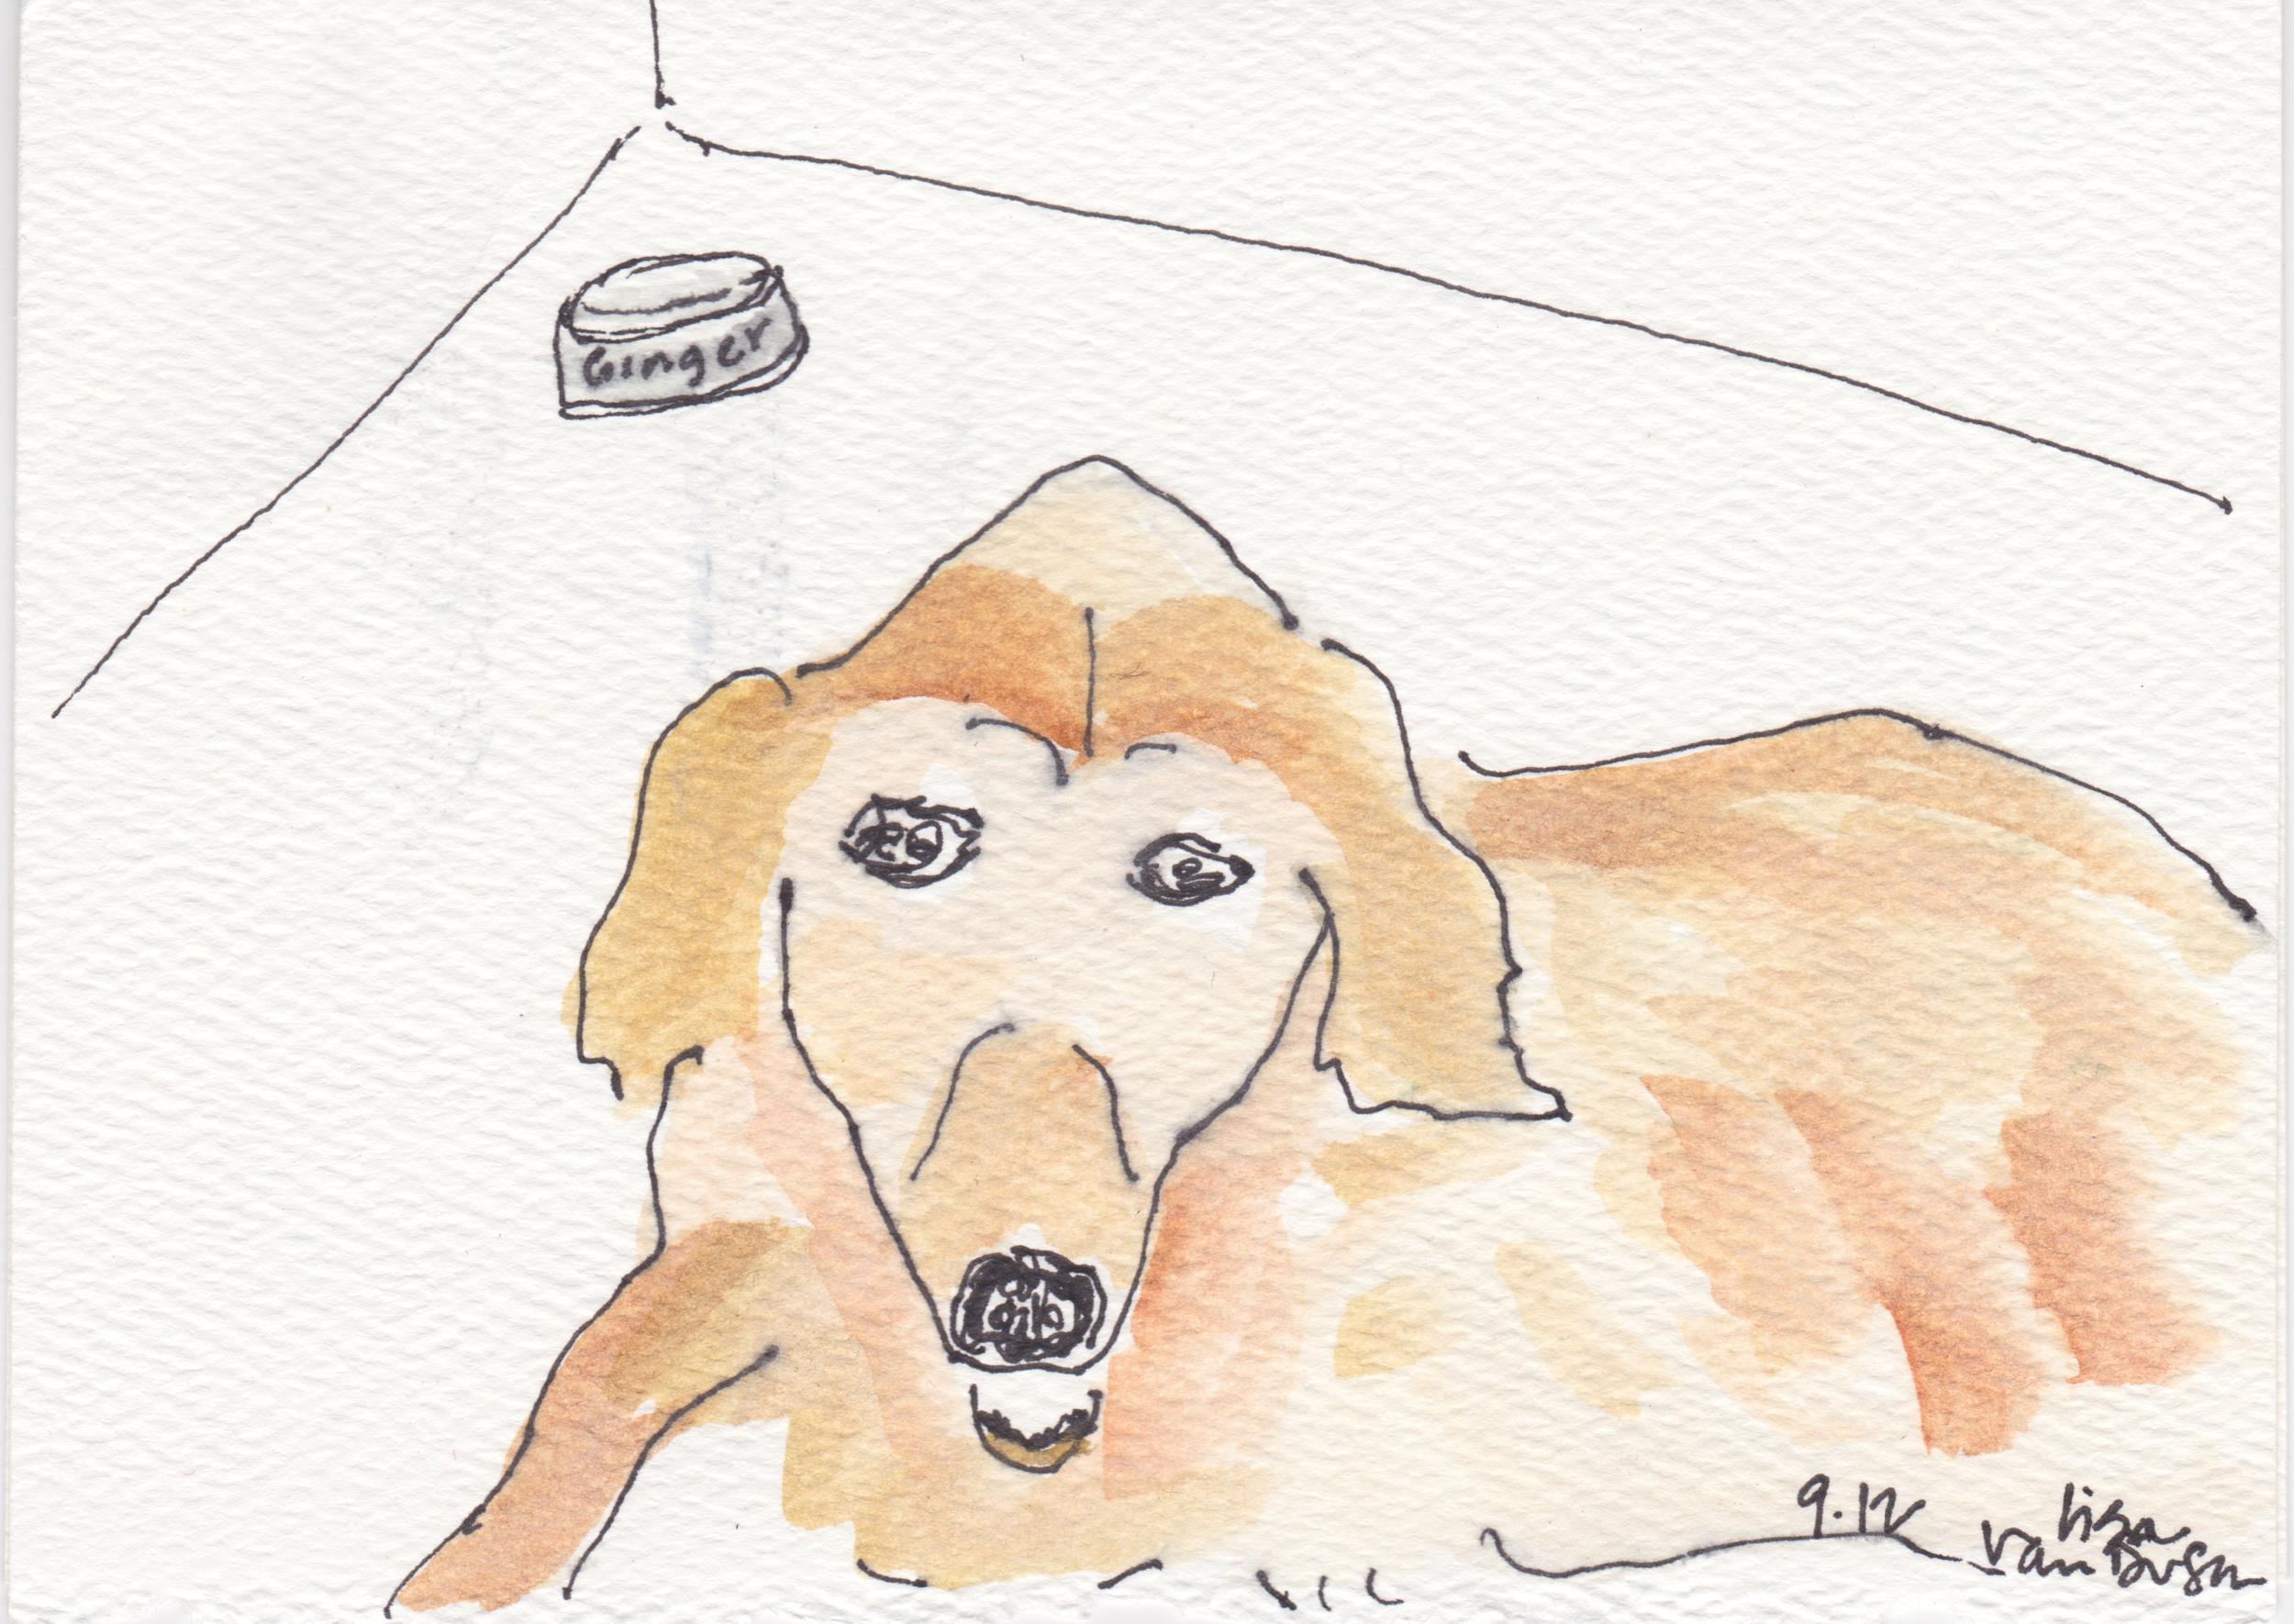 ginger was a fine, fine dog